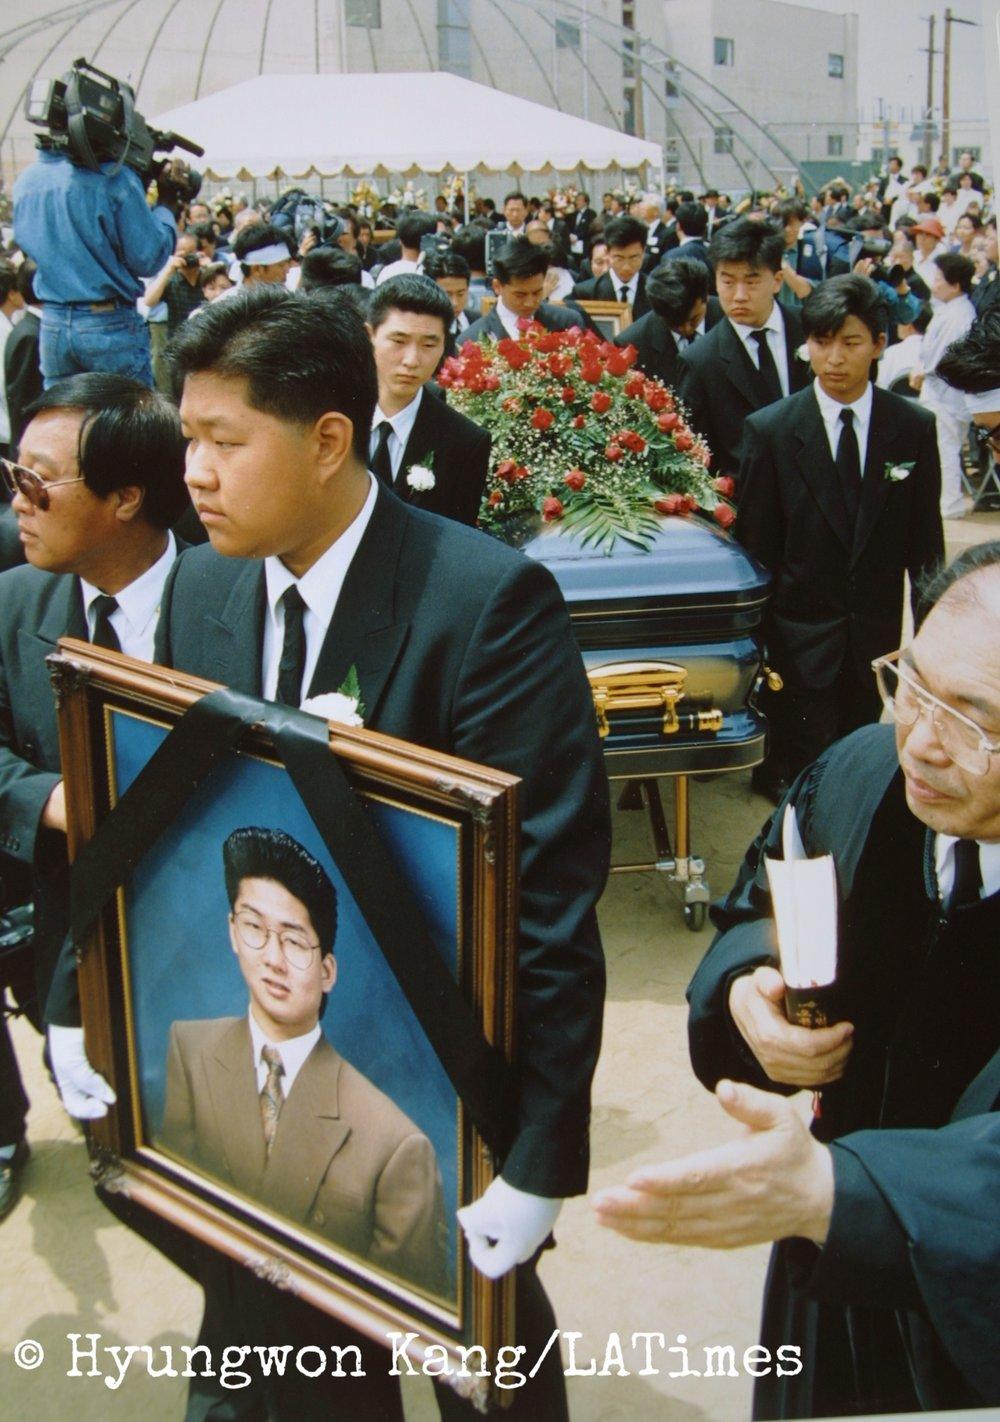 Eddie Lee laid to rest